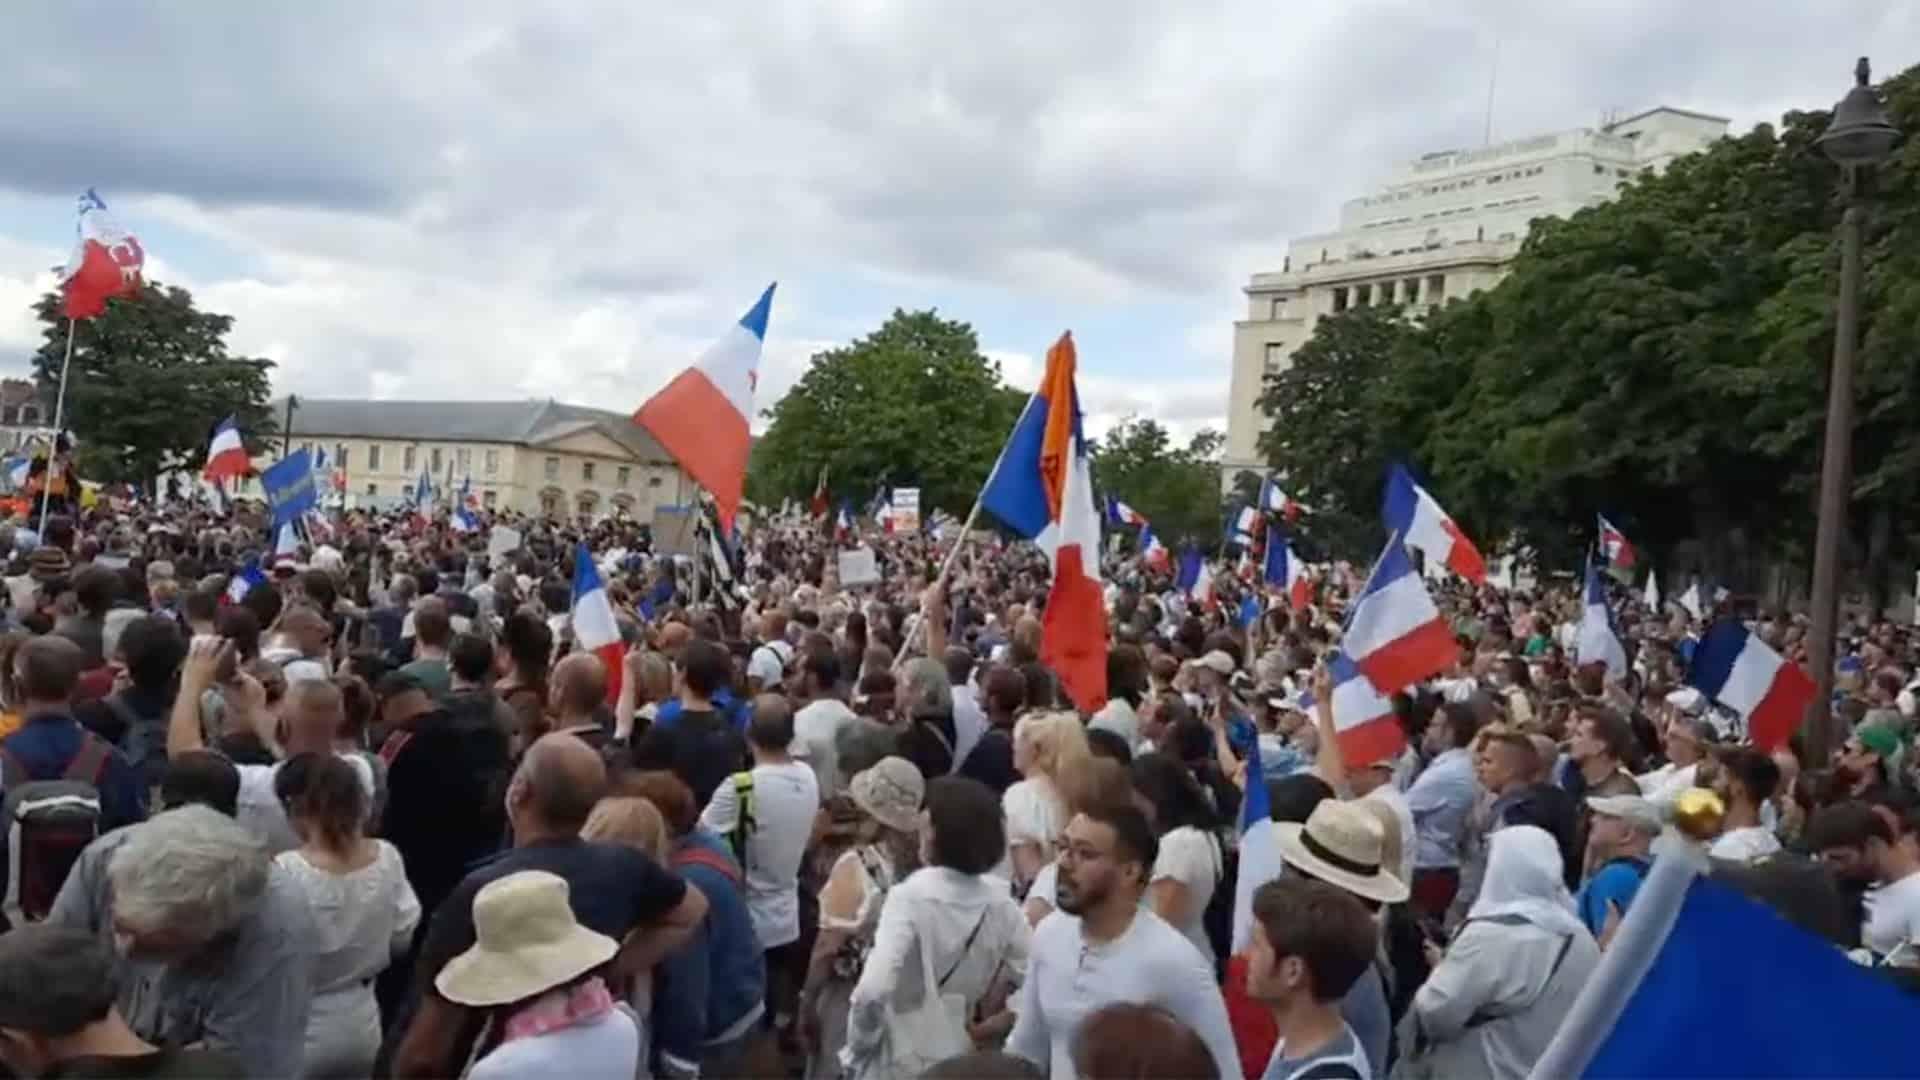 Manifestation anti-pass, Paris